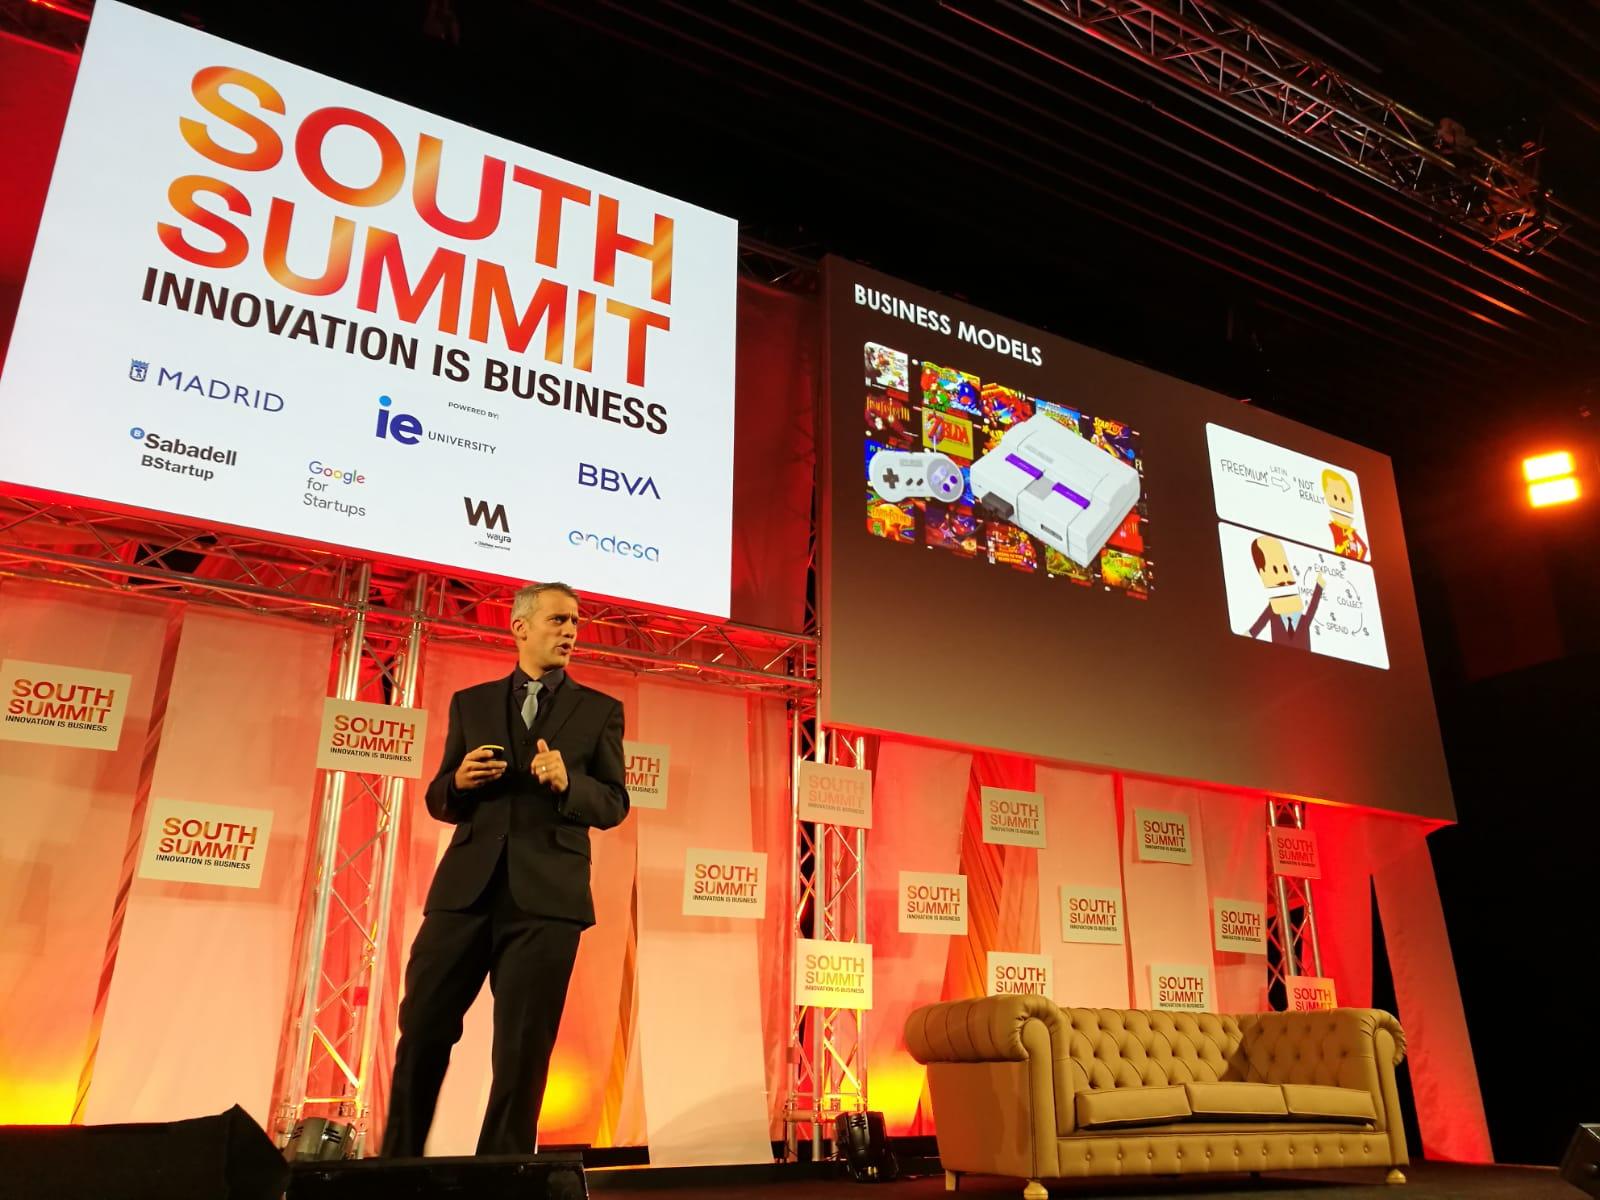 Jaime Gonzalo, Vicepresidente de Huawei Mobile Services en Europa, en el South Summit 2019.